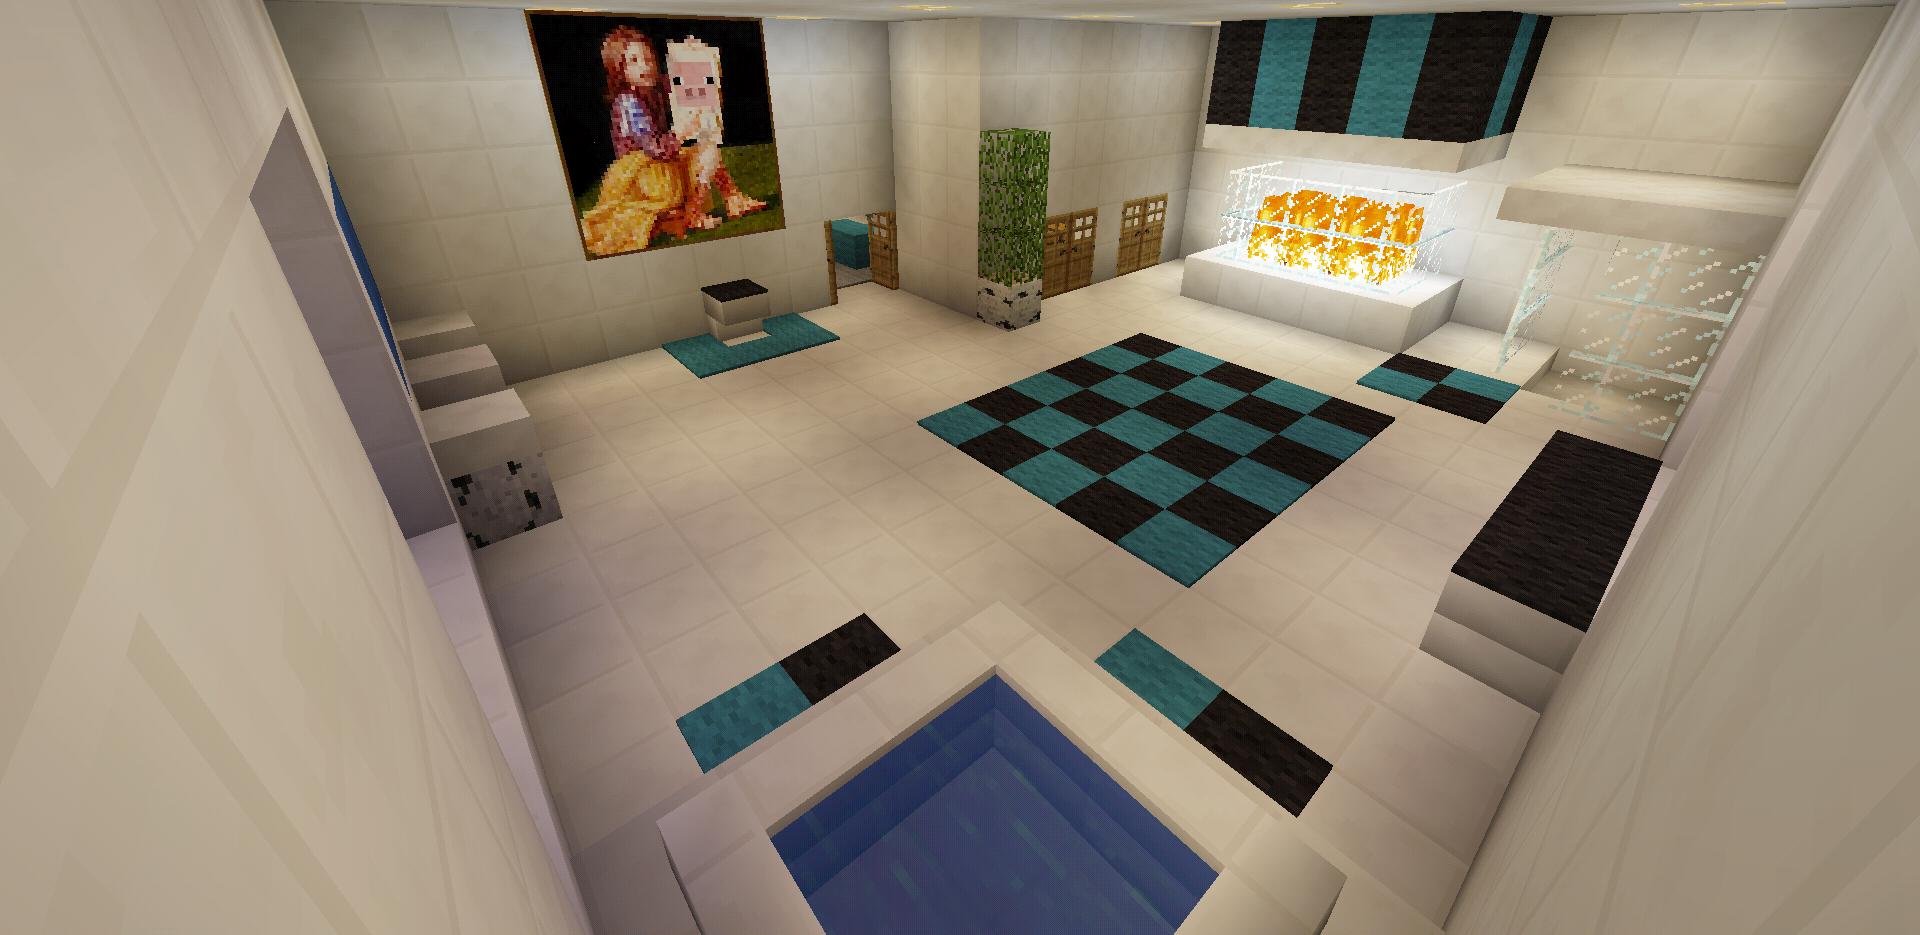 Minecraft Bathroom Garden Bath Tub Glass Shower Fireplace